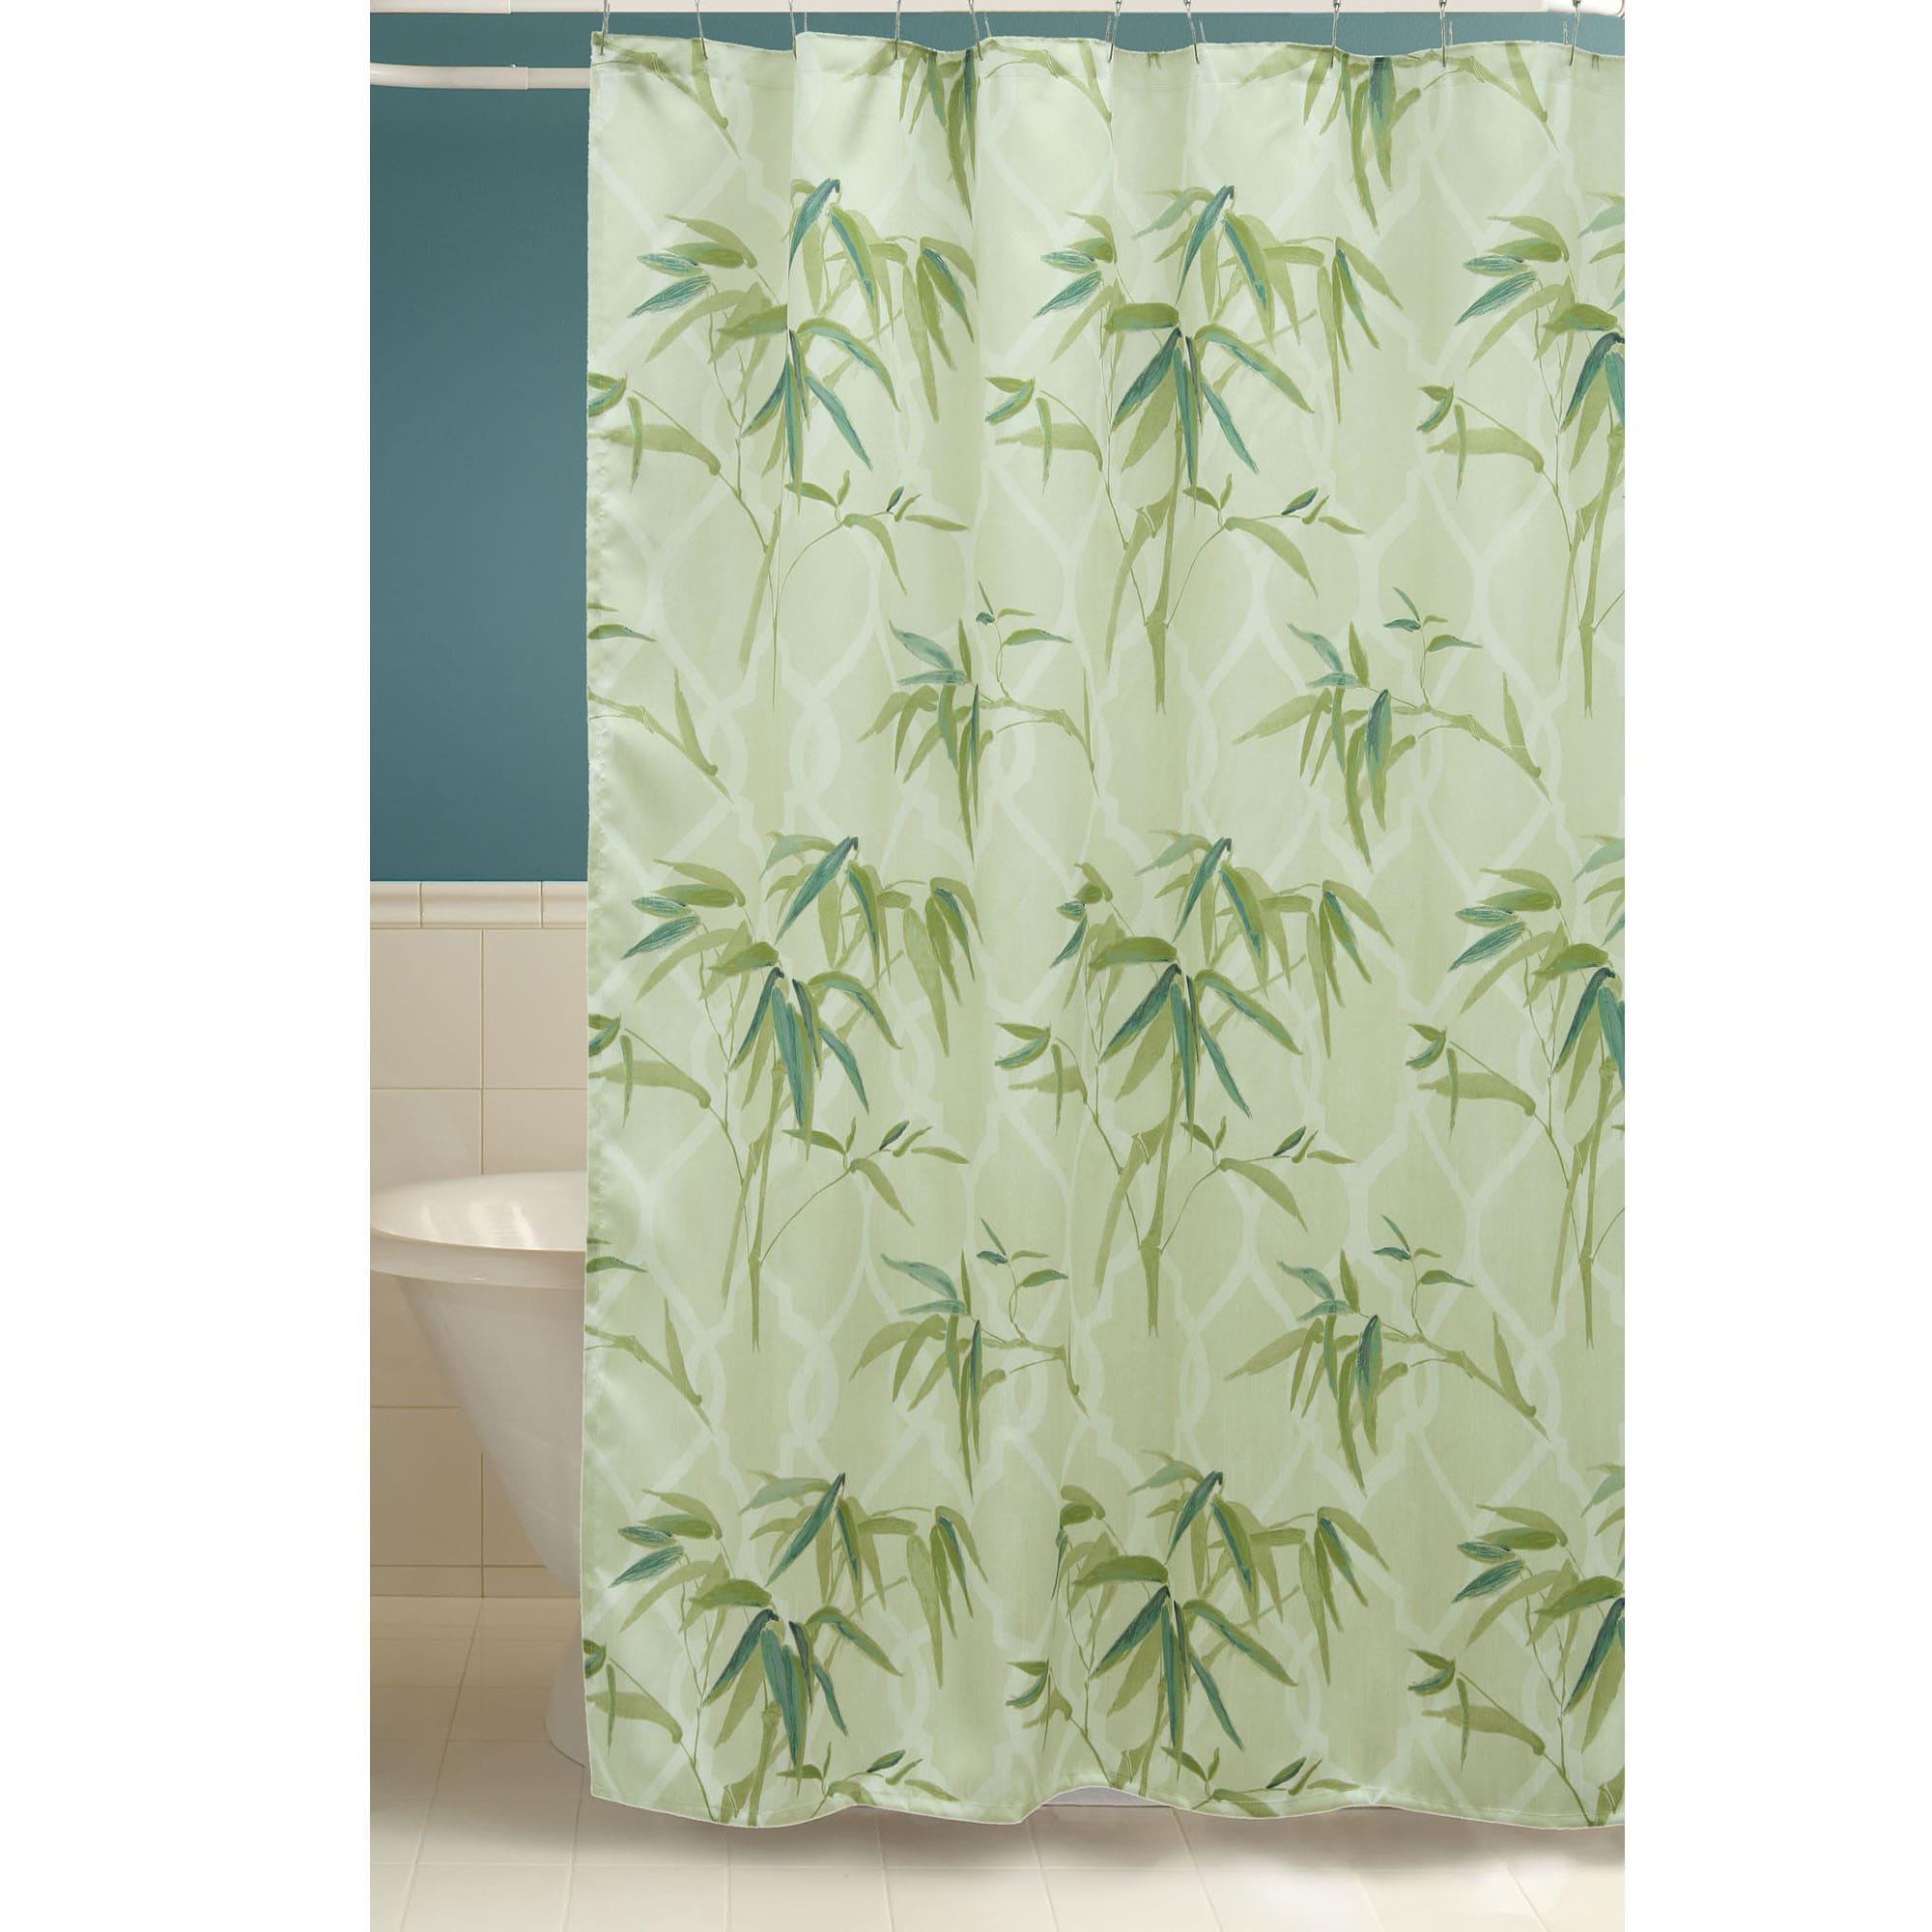 Shop Zen Bamboo Shower Curtain